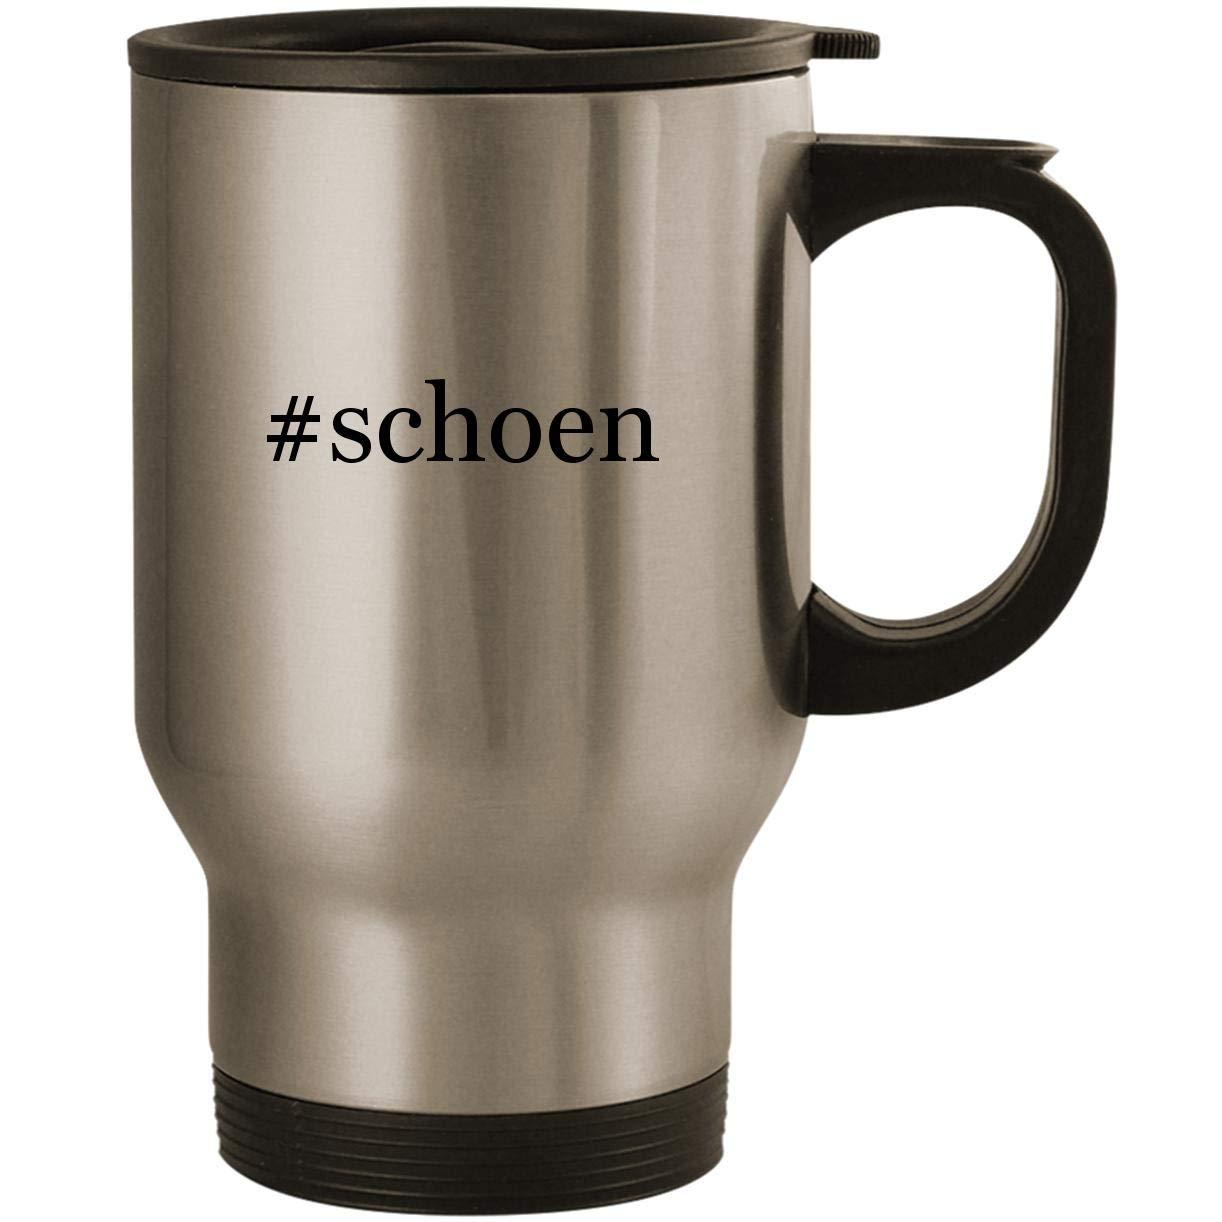 5d6f4b35f6e Amazon.com: #schoen - Stainless Steel 14oz Road Ready Travel Mug, Silver:  Kitchen & Dining